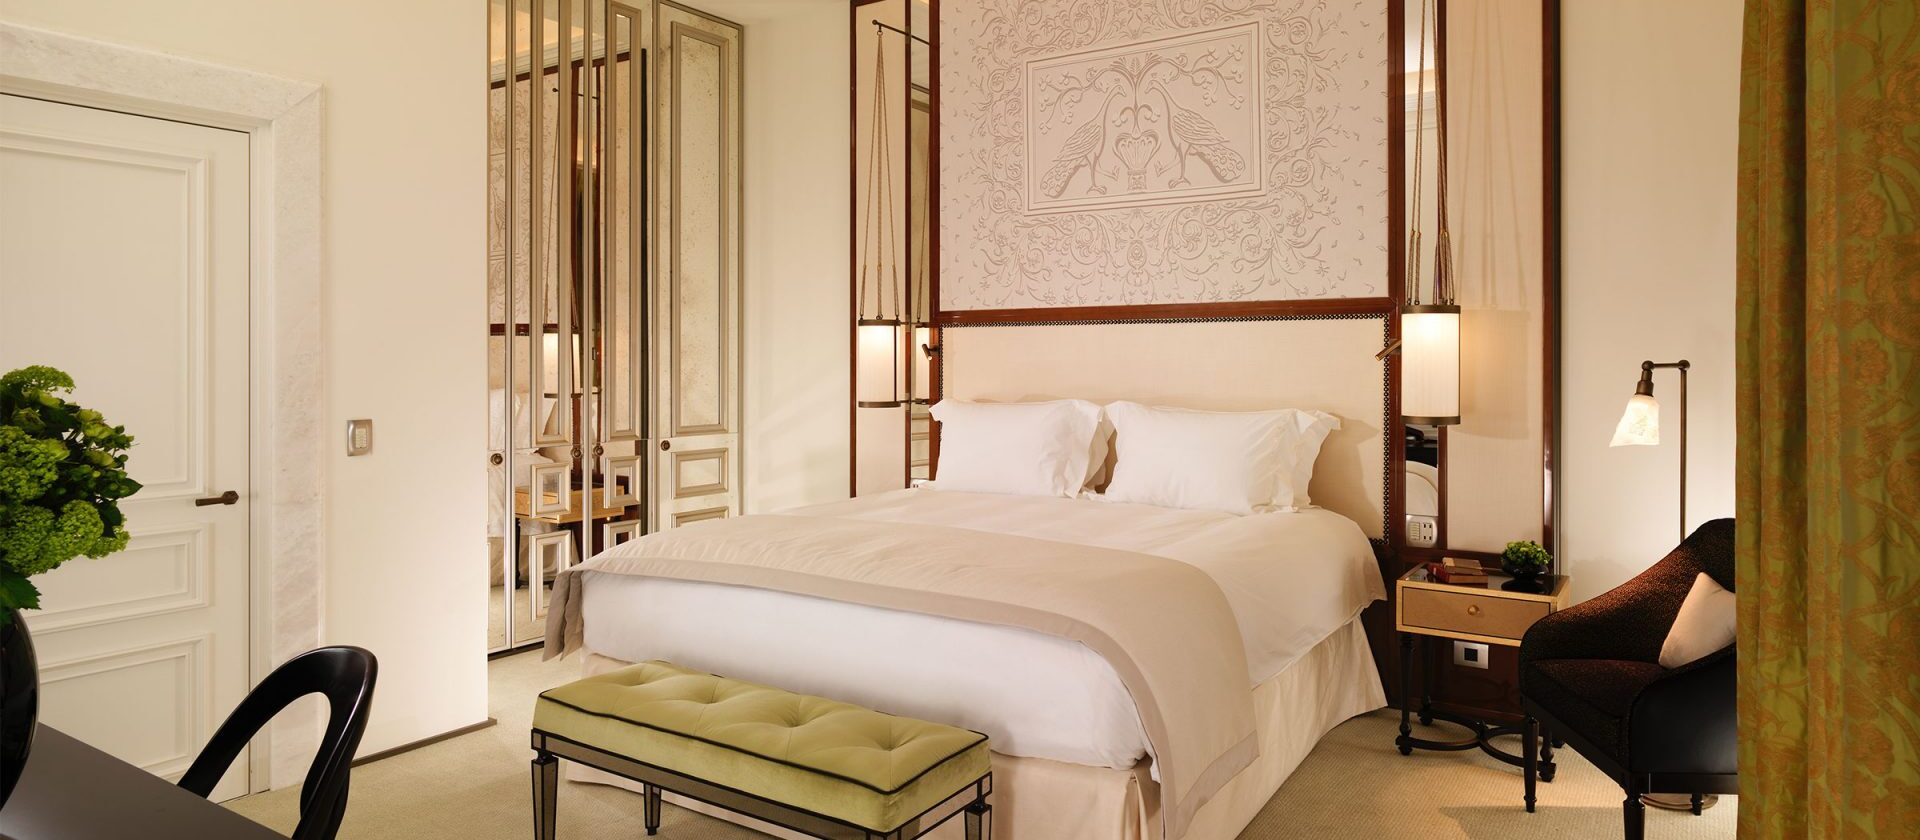 Bedroom in a prestige room at Hotel Eden